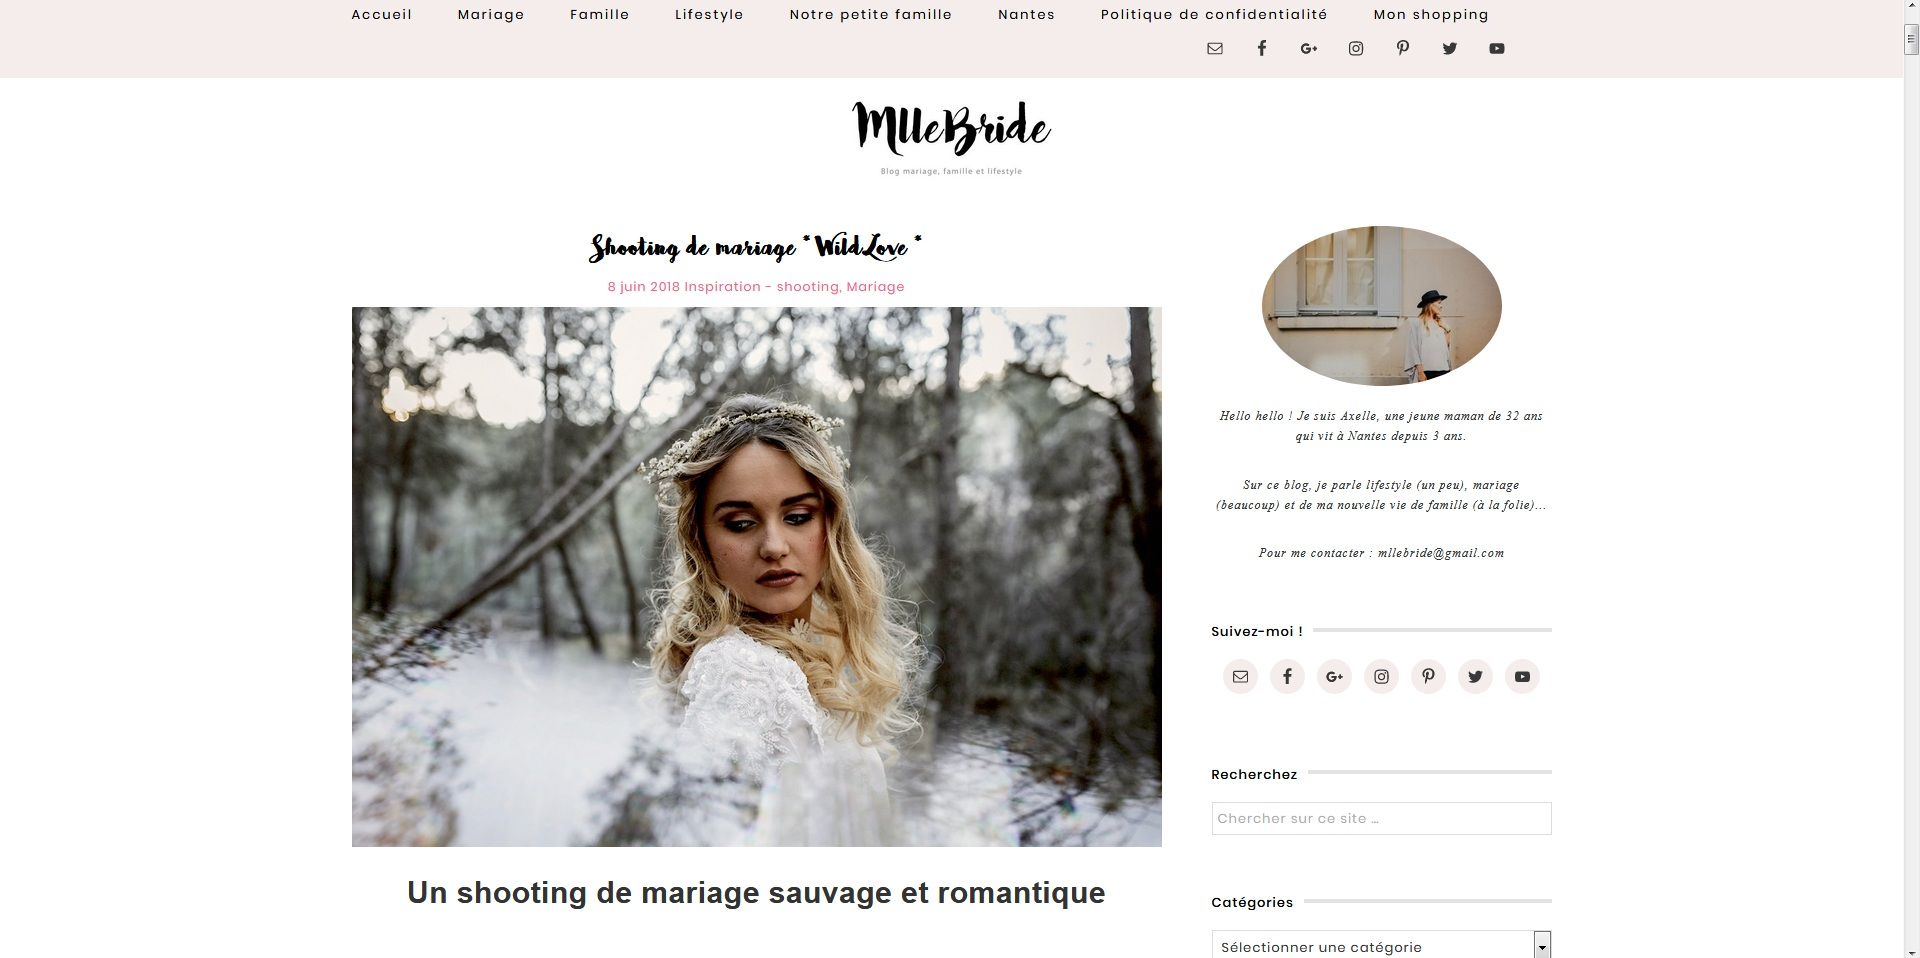 Mlle Bride